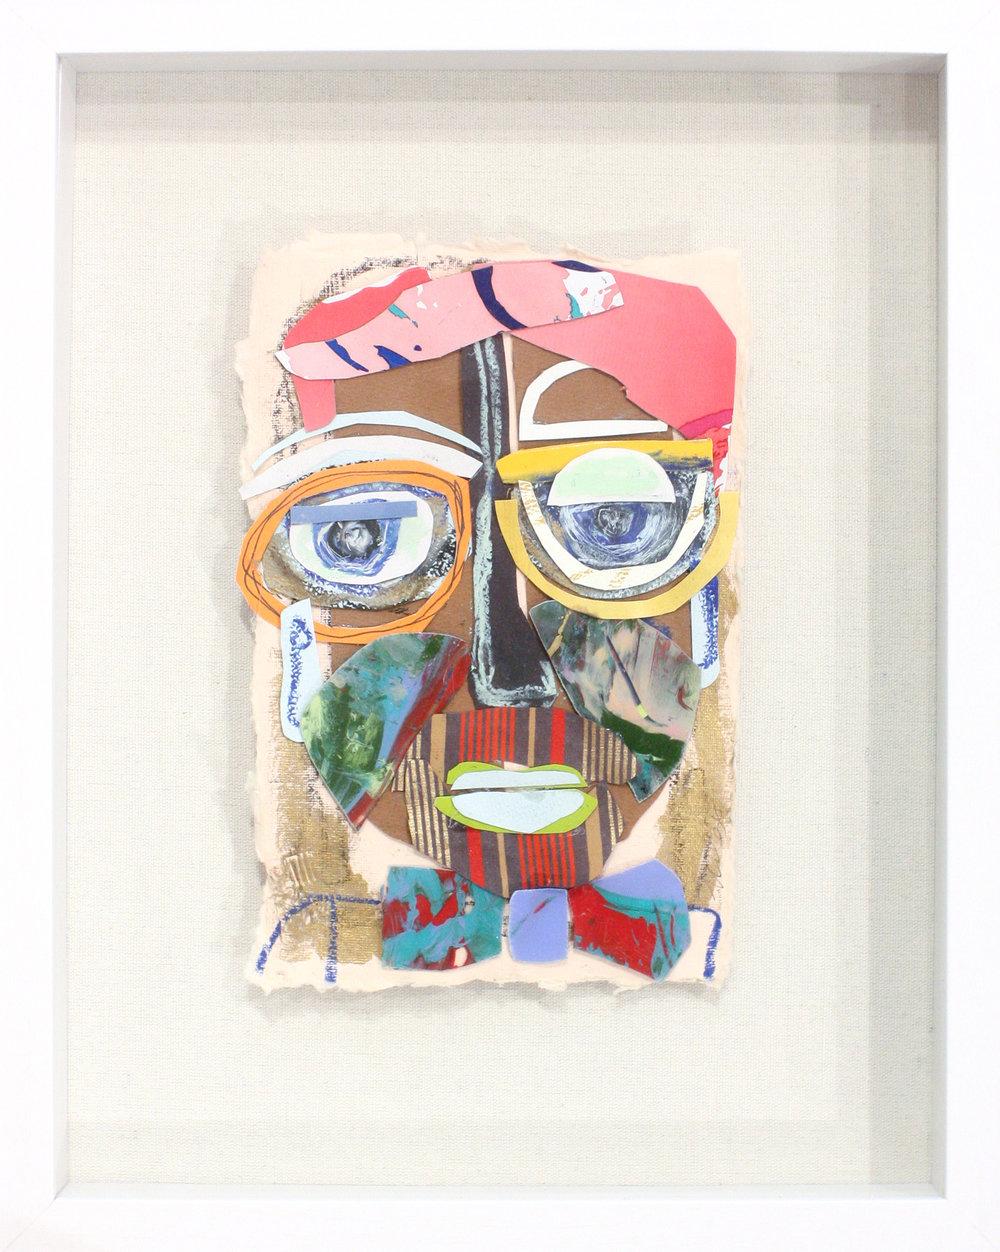 "Fredrick - 4"" x 6"" artwork, 11"" x 14"" frameMixed media, white shadowbox frame$395"